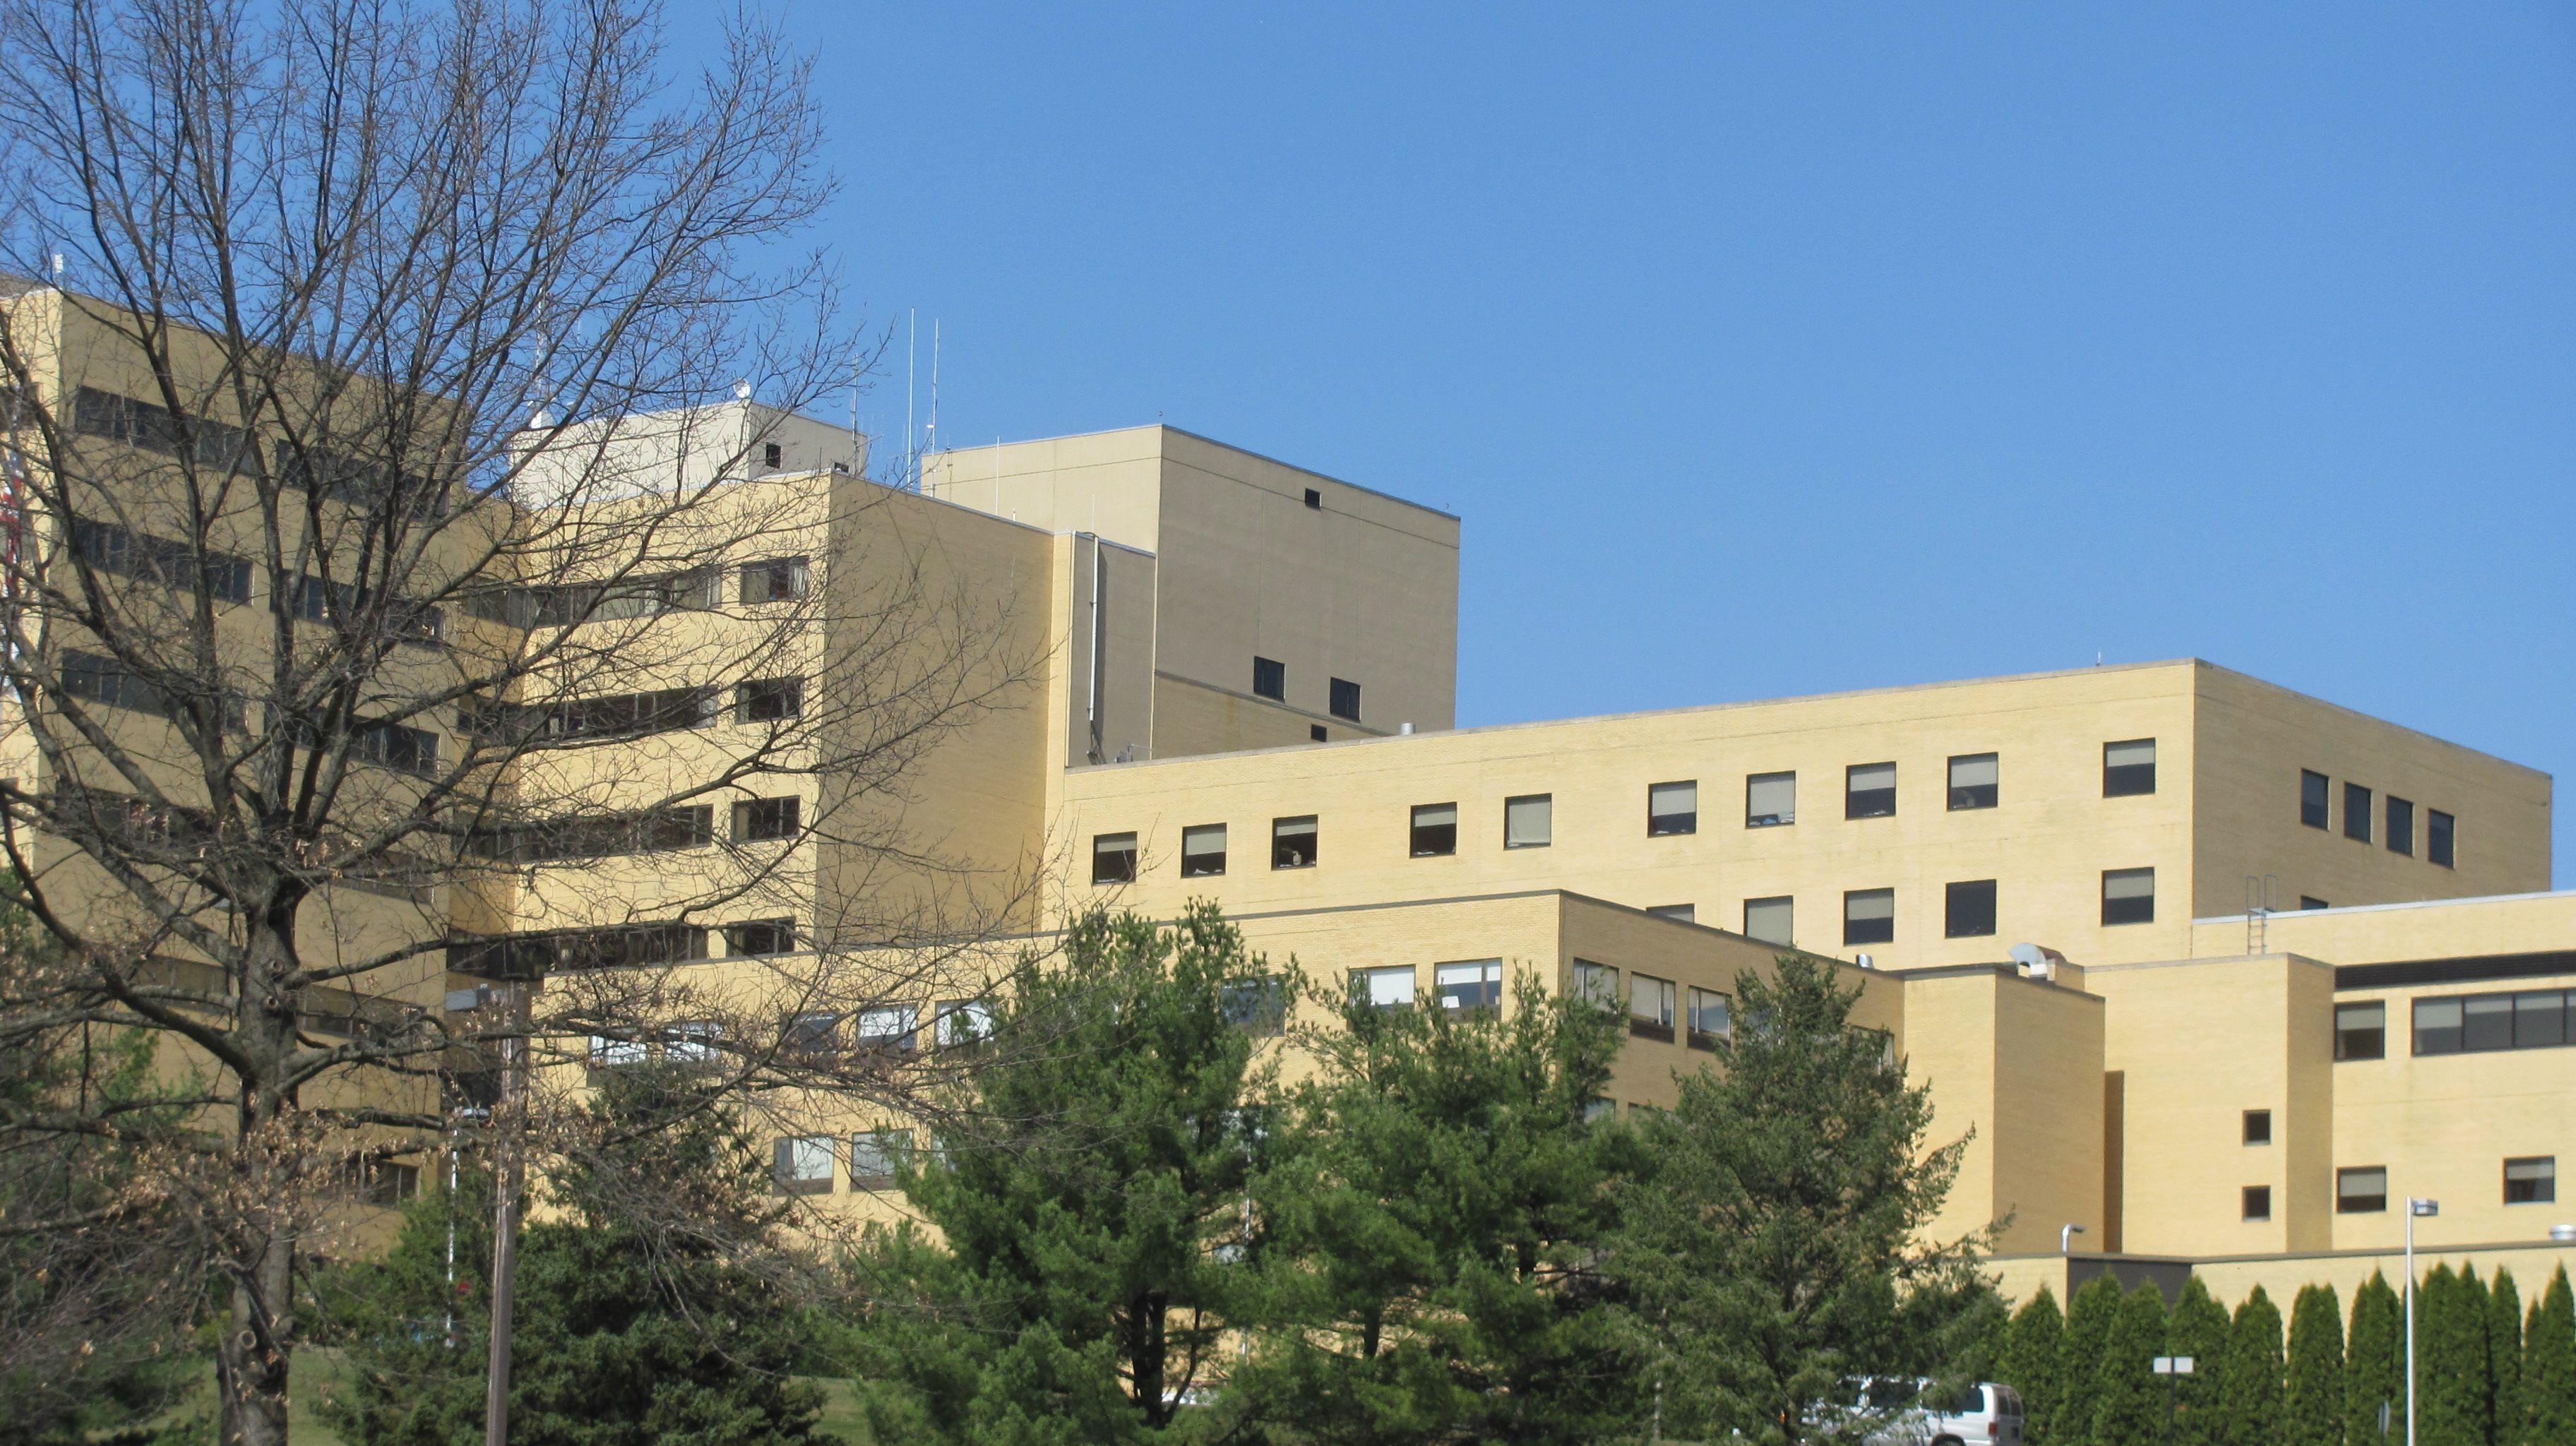 geisinger medical center a huge blessing in our backyard